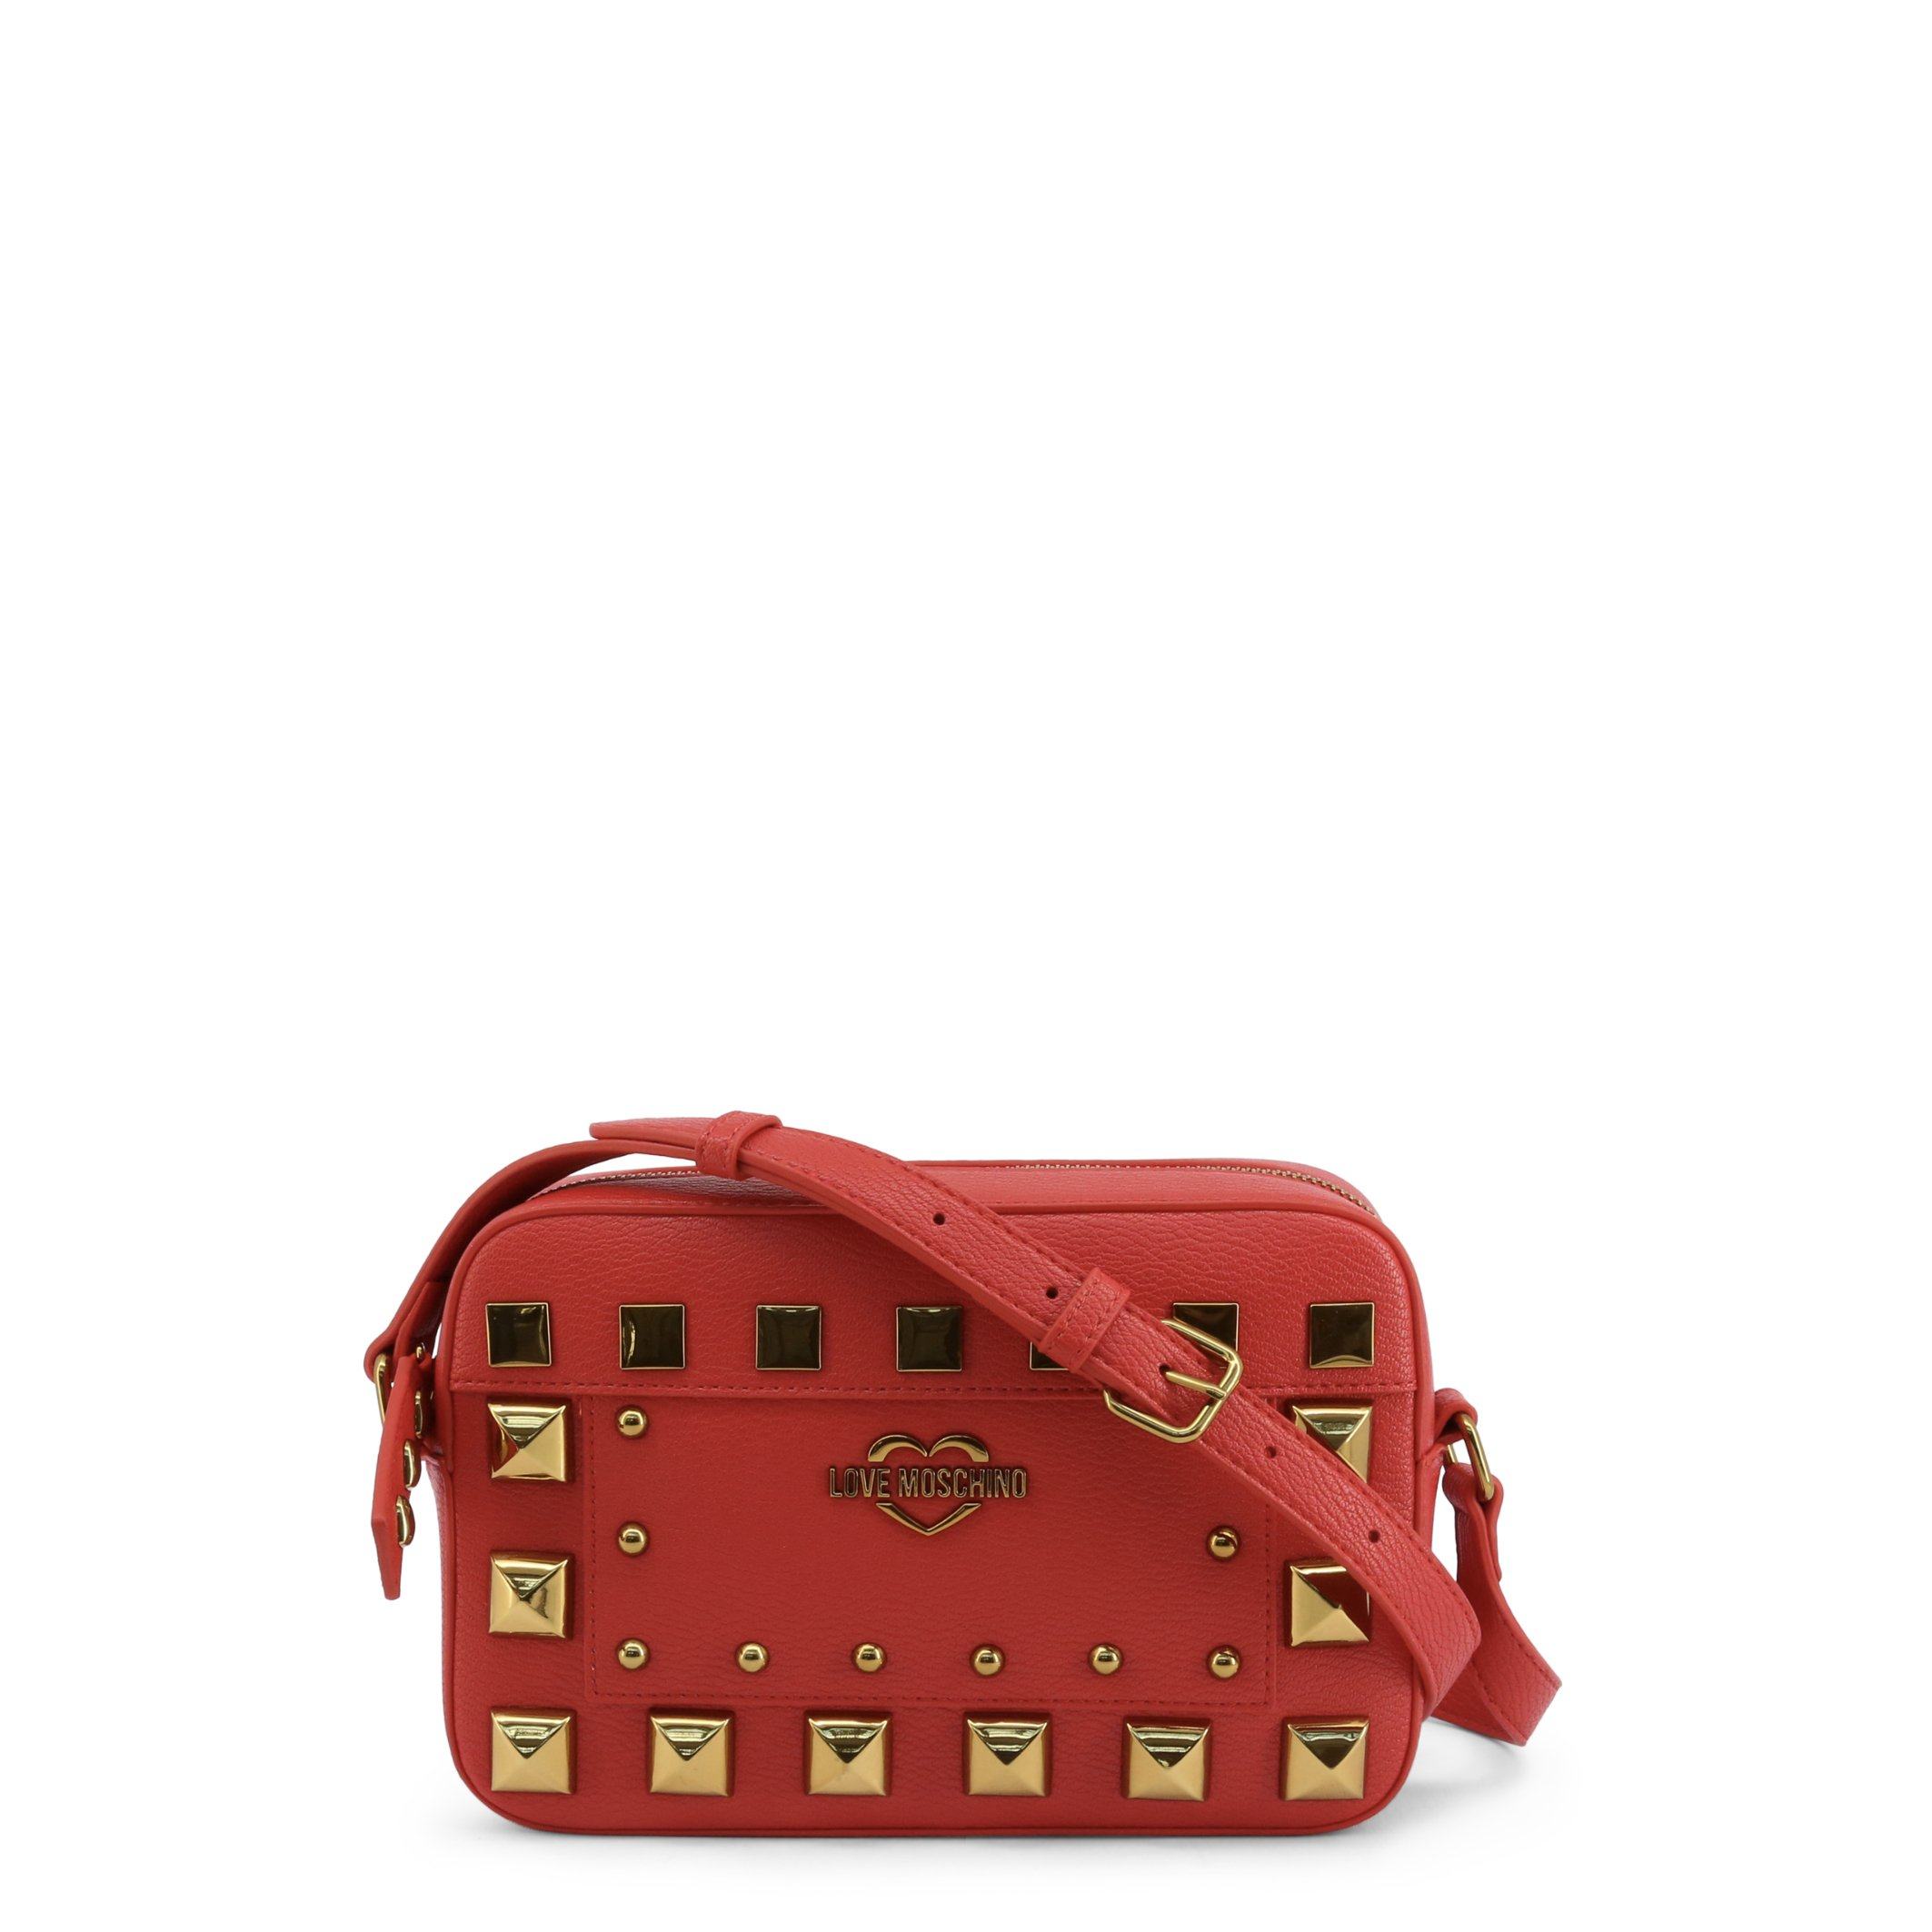 Love Moschino Women's Crossbody Bag Various Colours JC4286PP0BKO - red NOSIZE